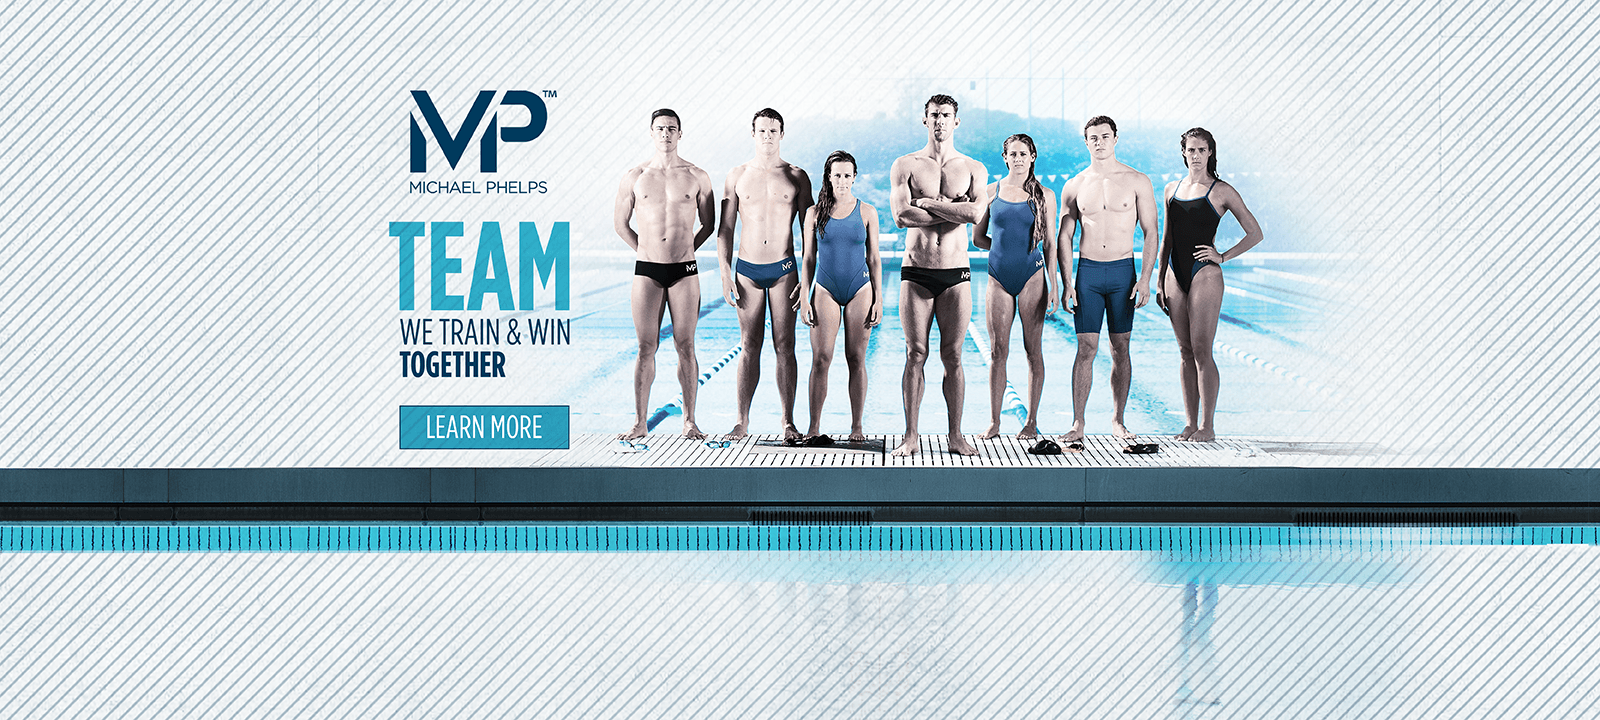 MP Brand Expands Swimwear Line to Swim Teams